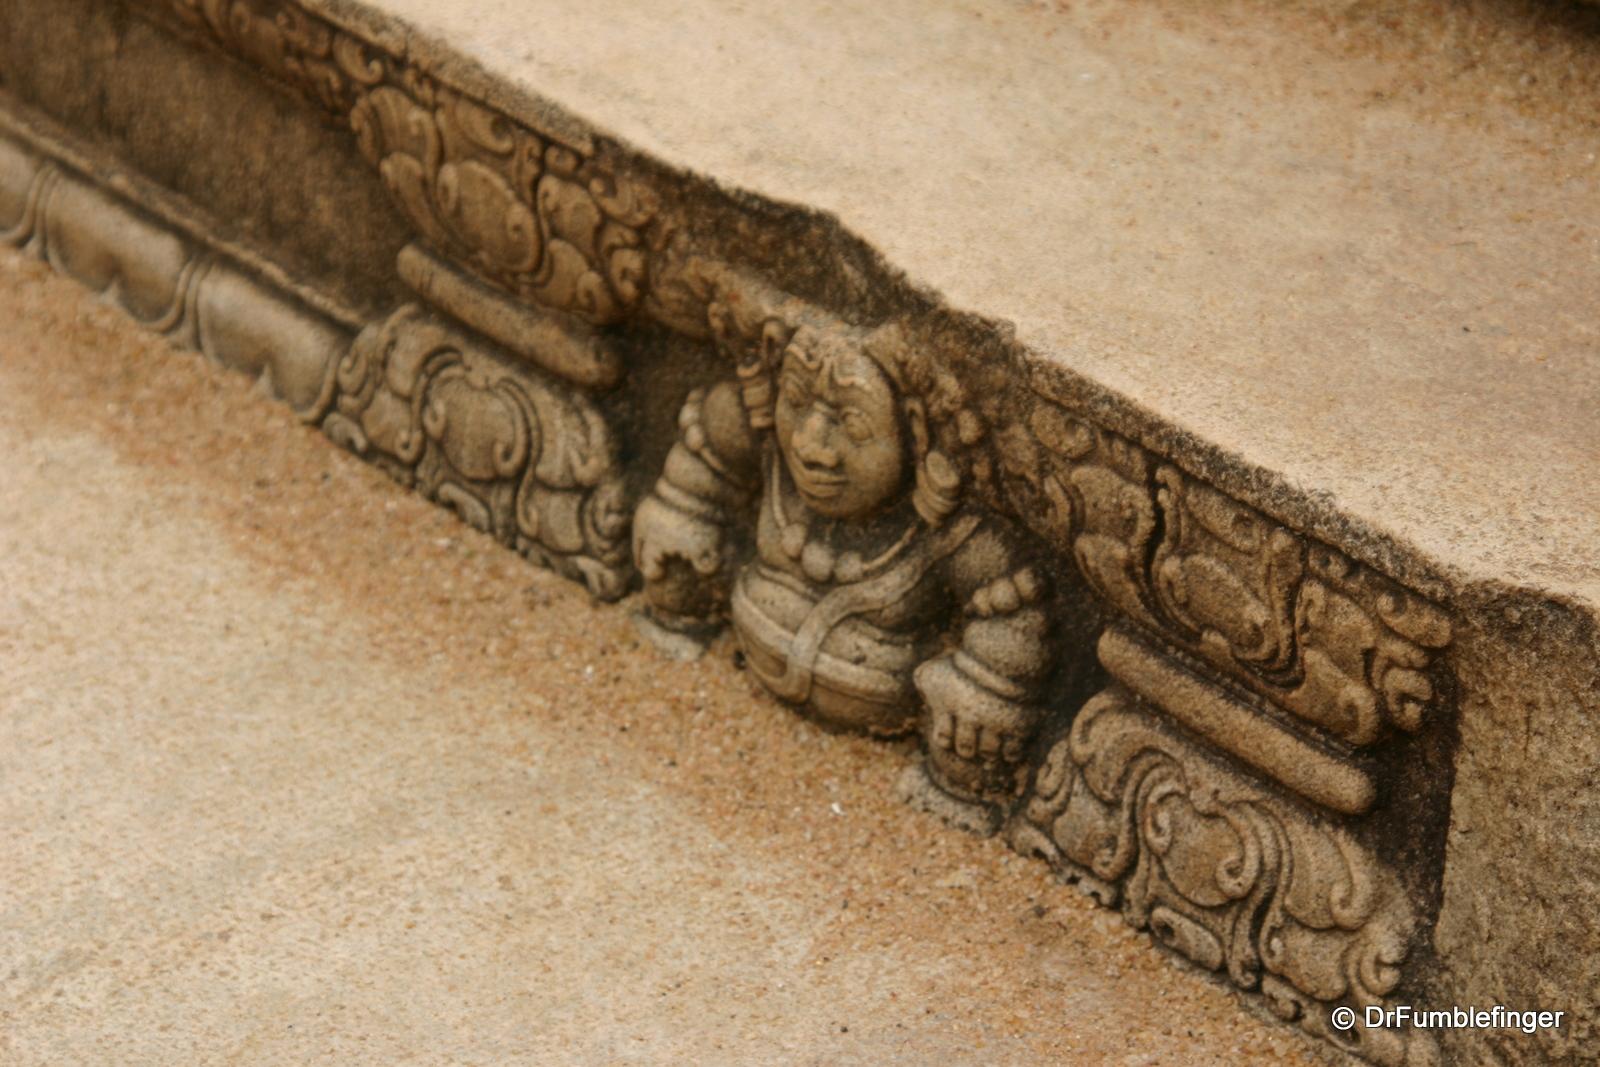 Anuradhapura -- Carving into step